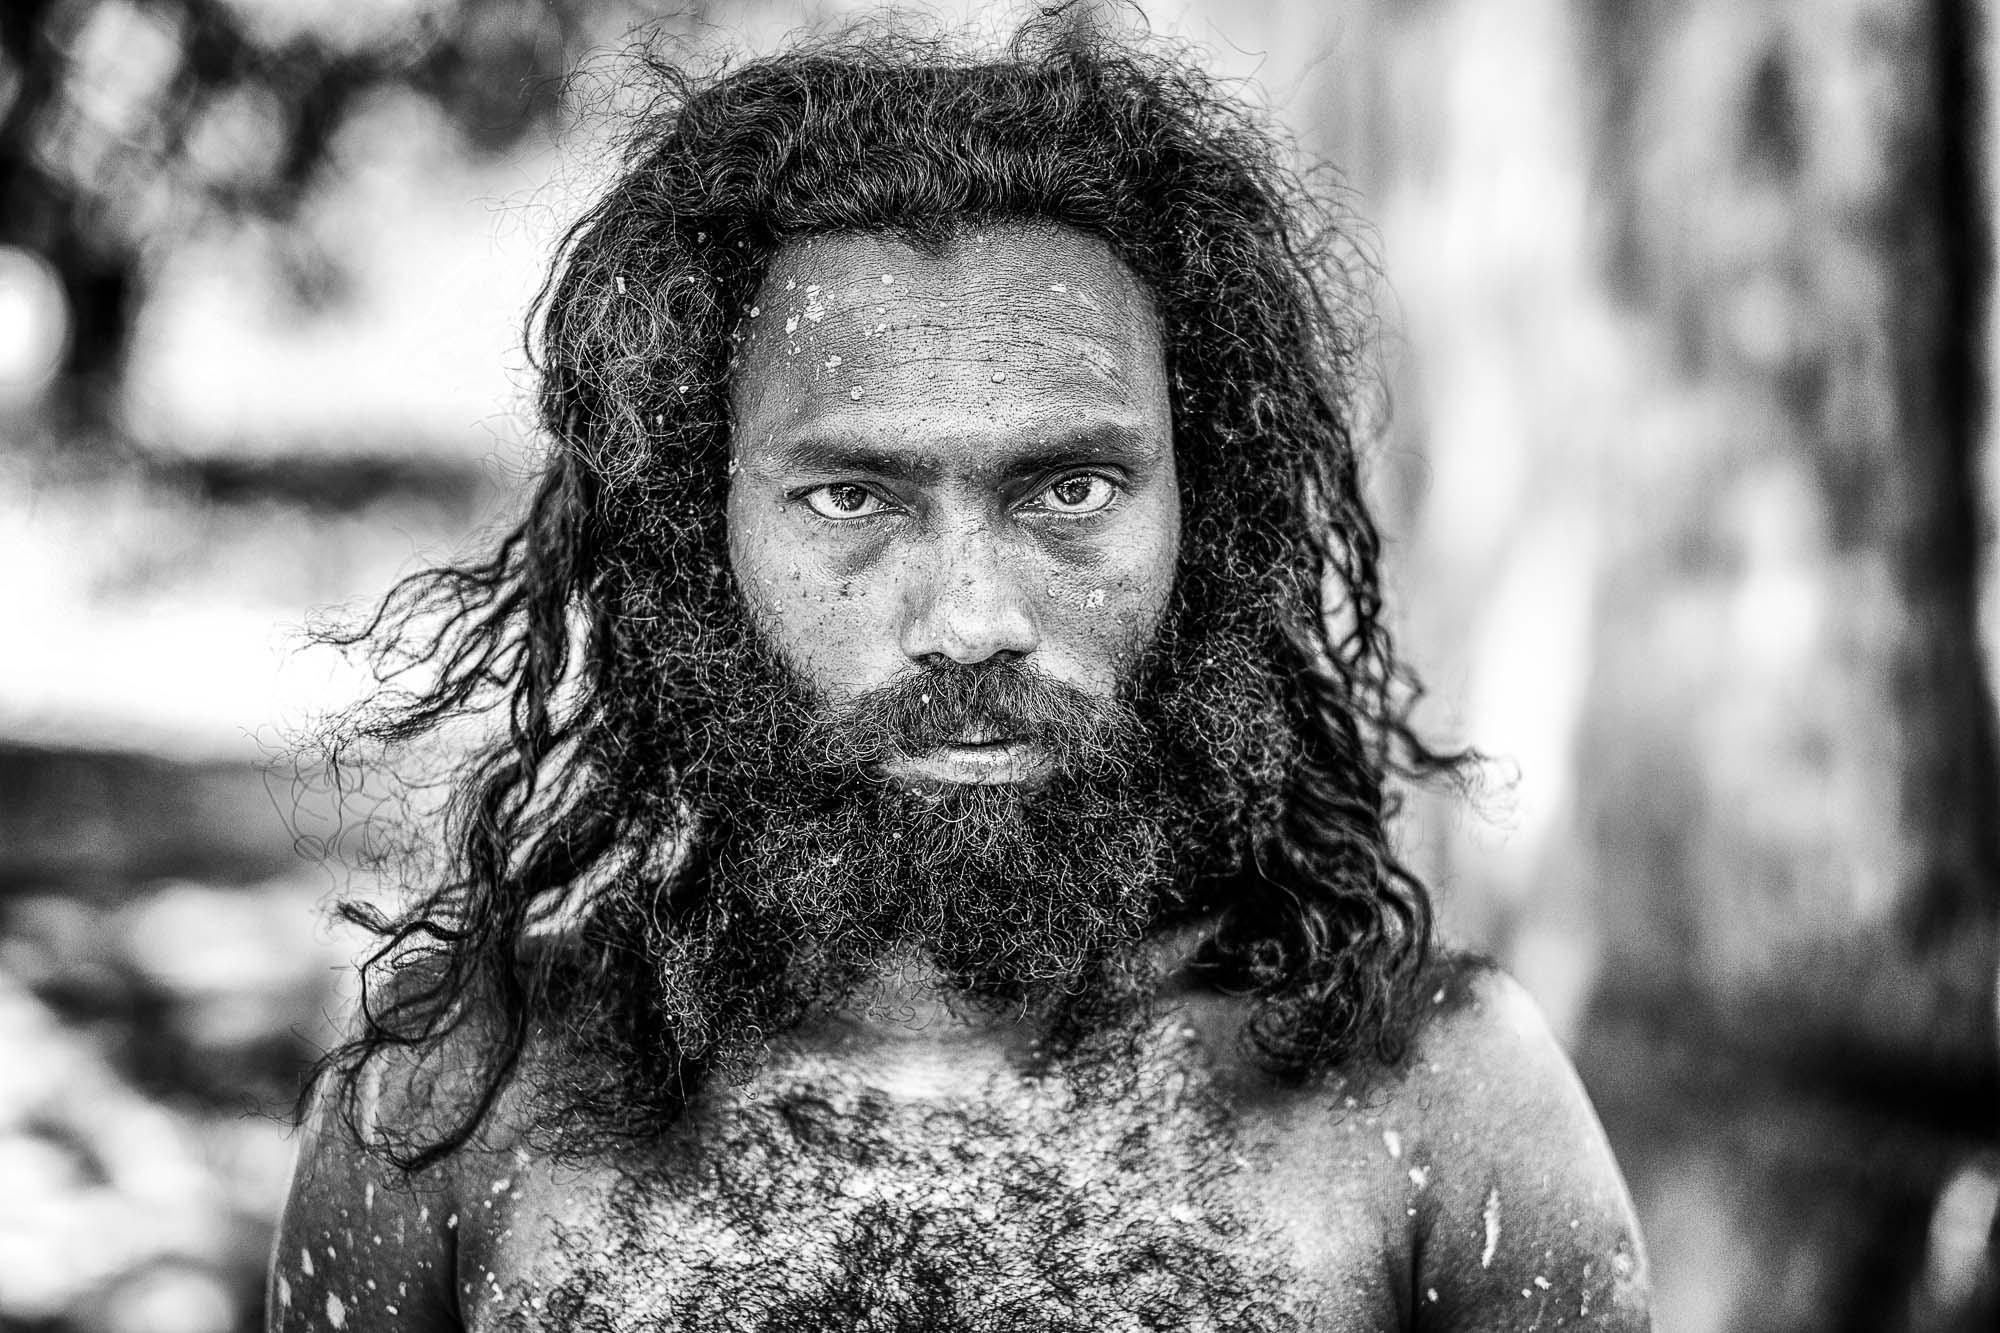 Vadda sri lanka indingenous group people - veddas portrait photography man beard long hair